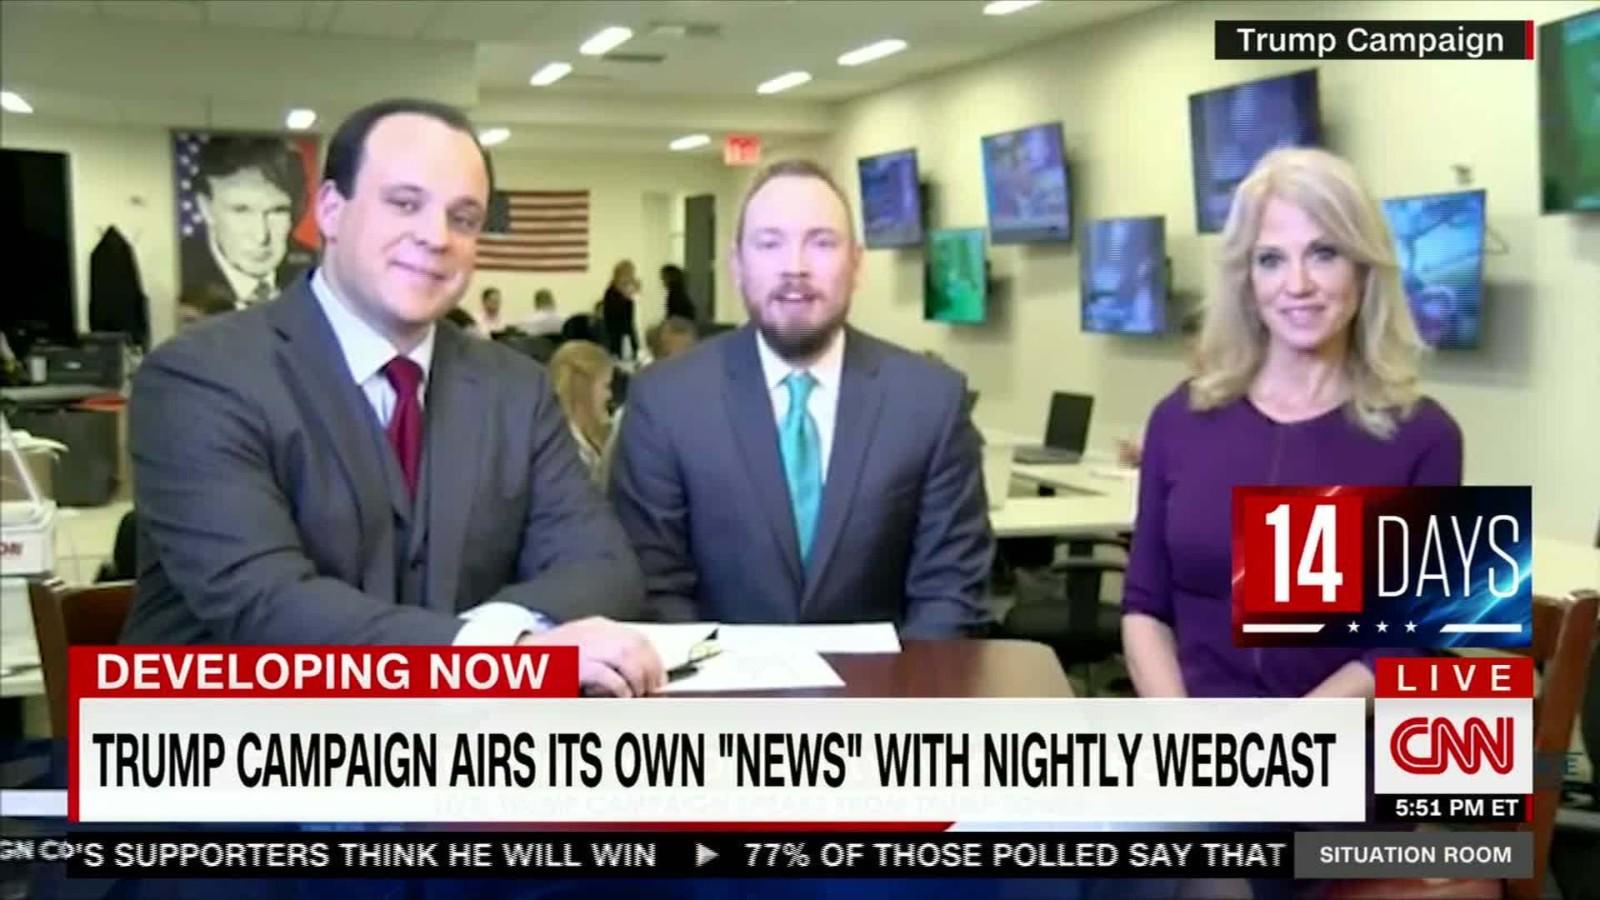 Trump Tower Live Webcasts Debut   CNN Video